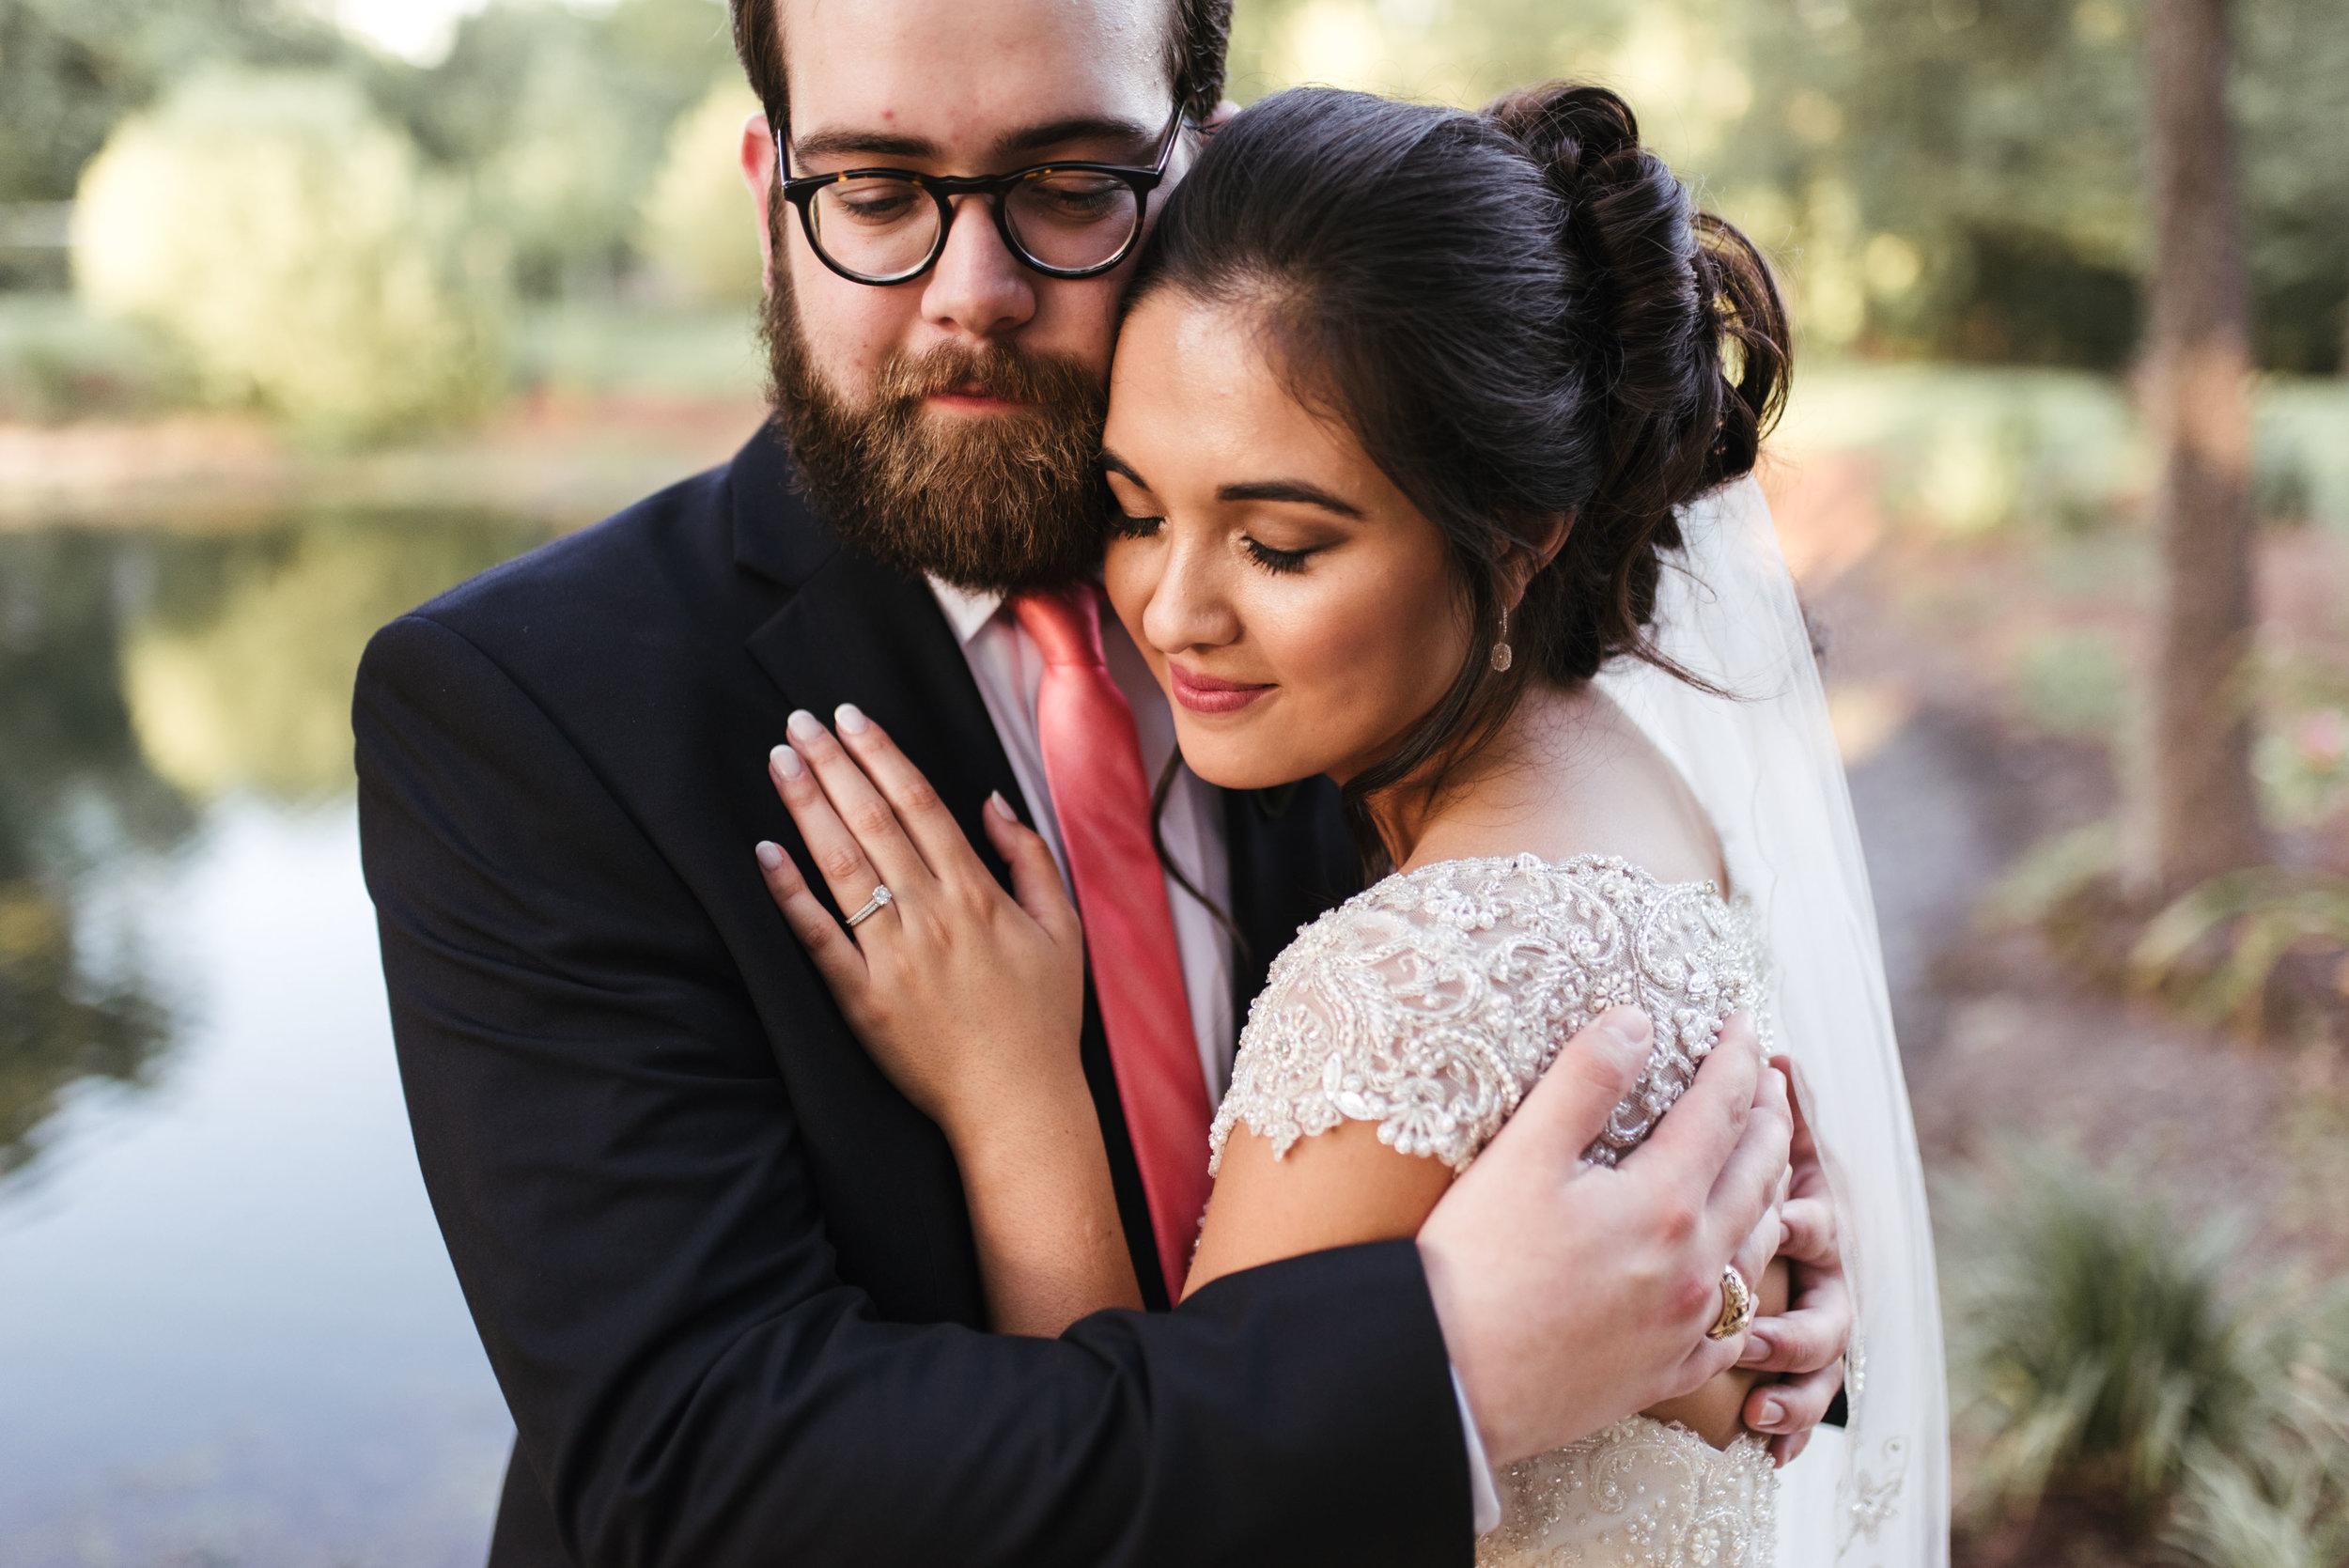 Stone Oak Ranch Wedding | Murchison, TX wedding | Fort Worth Wedding Photographer | www.jordanmitchellphotography.com